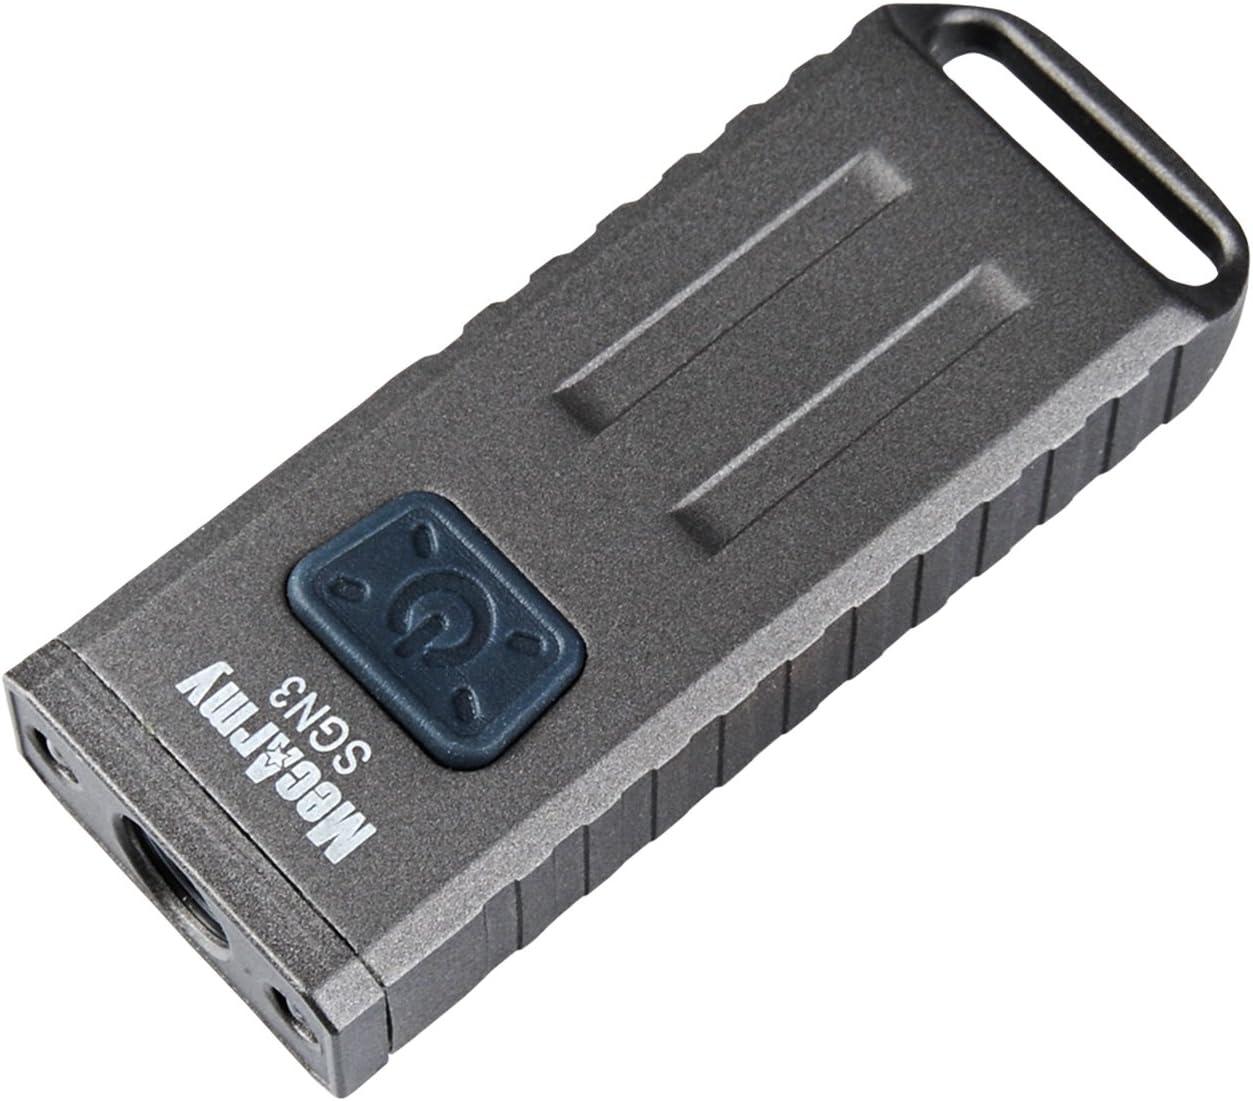 Image of a silver mini keychain MecArmy SGN3 flashlight.